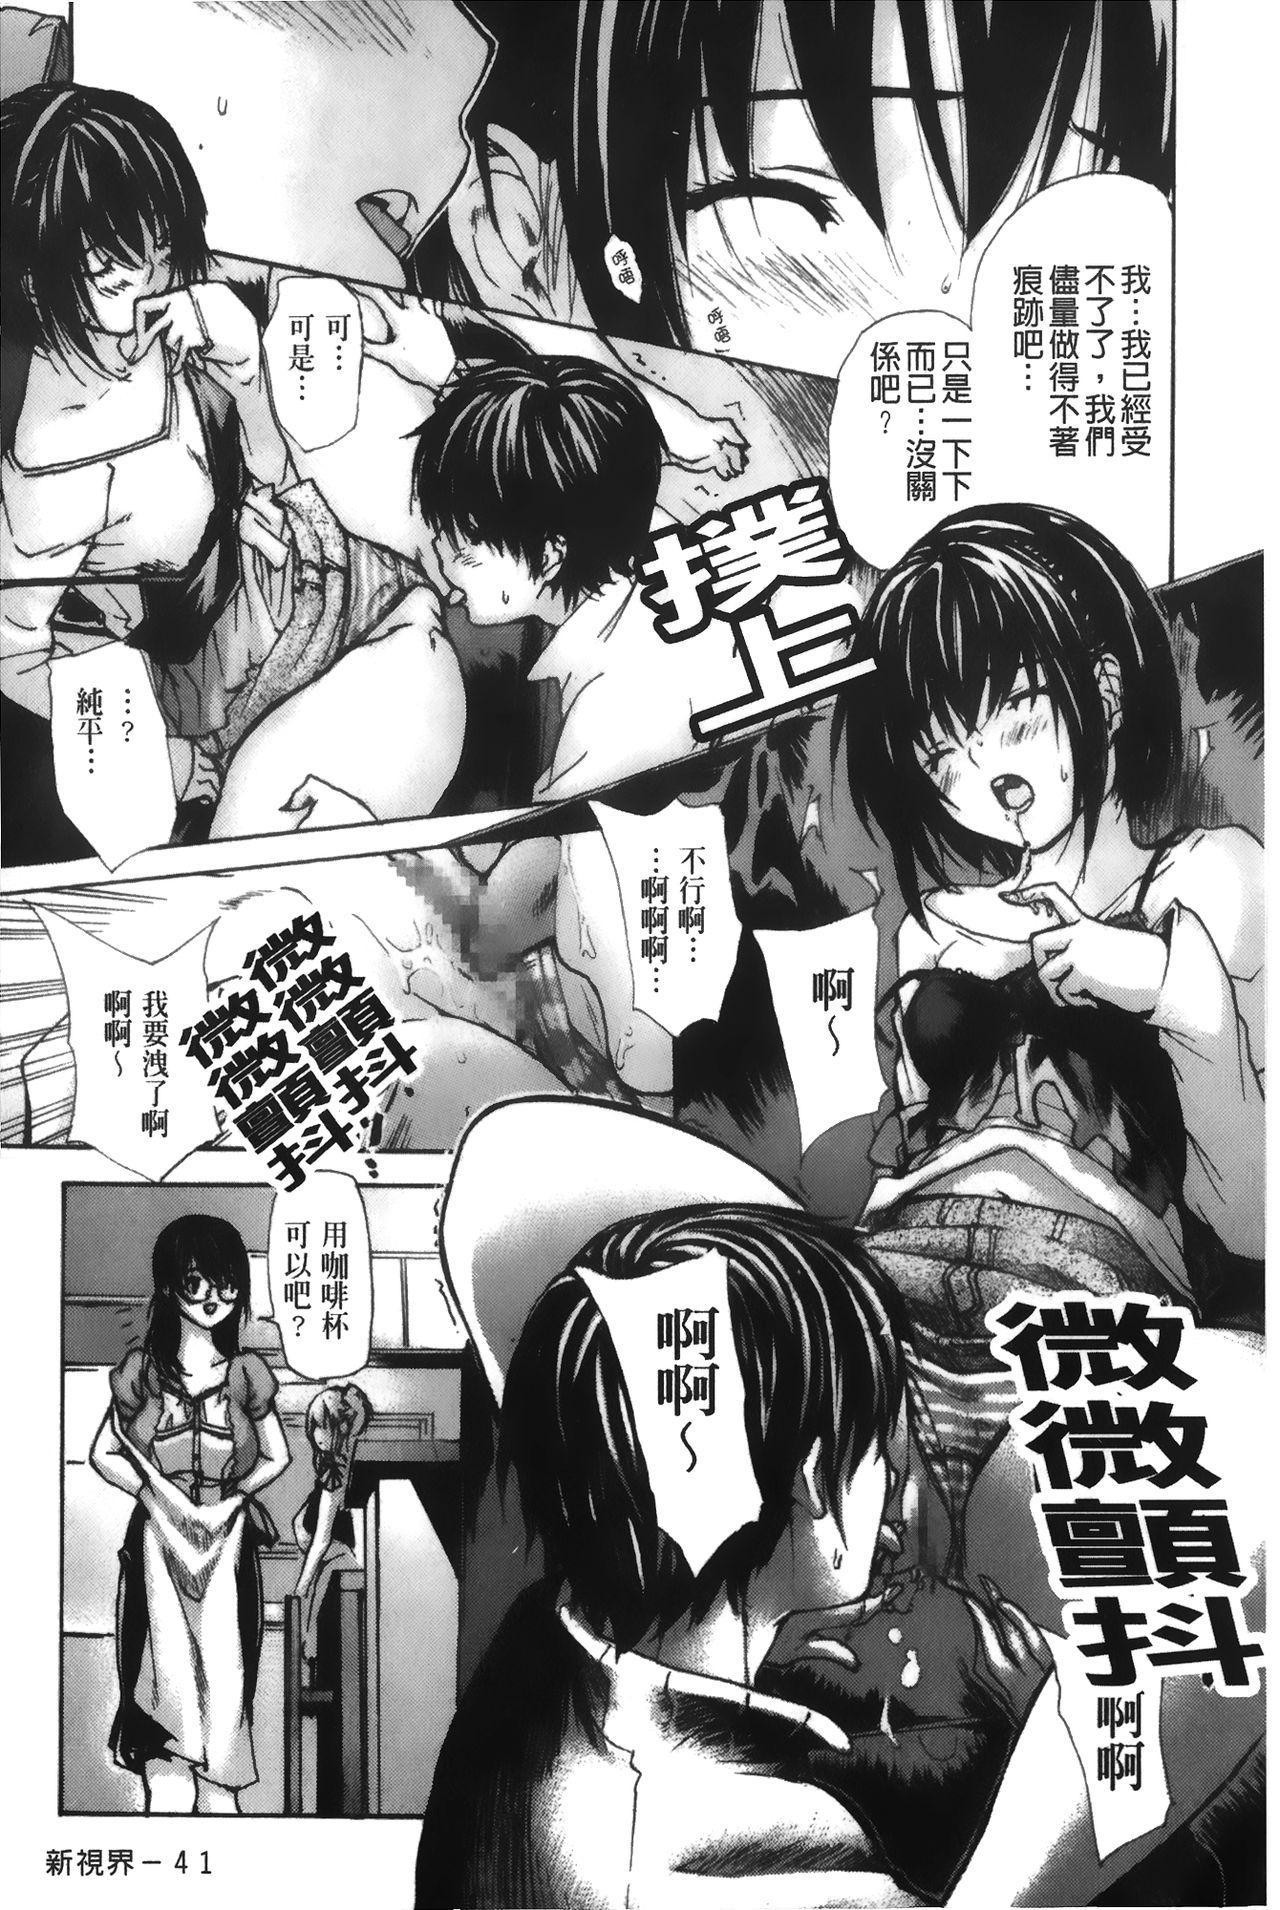 Tonari no Minano Sensei 4 | 隔壁的美奈乃老師 4 208